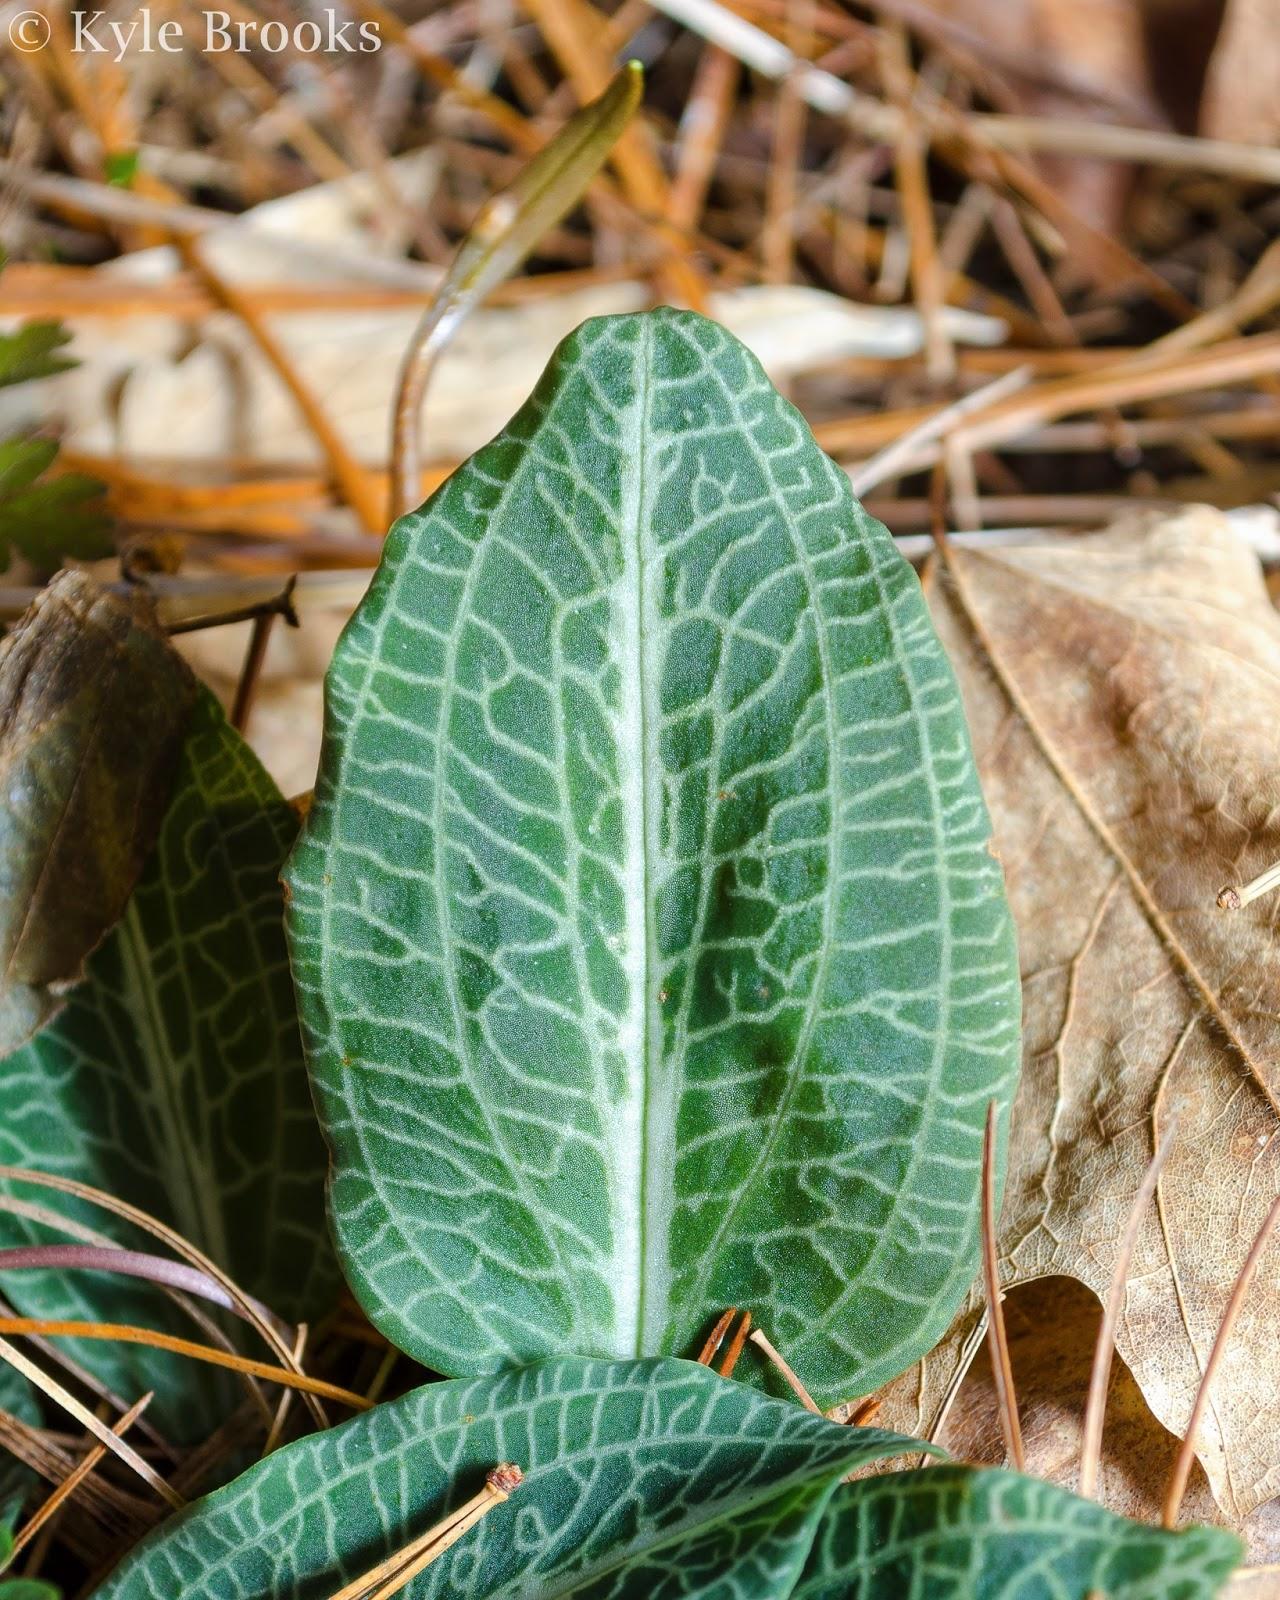 Goodyera pubescens leaf